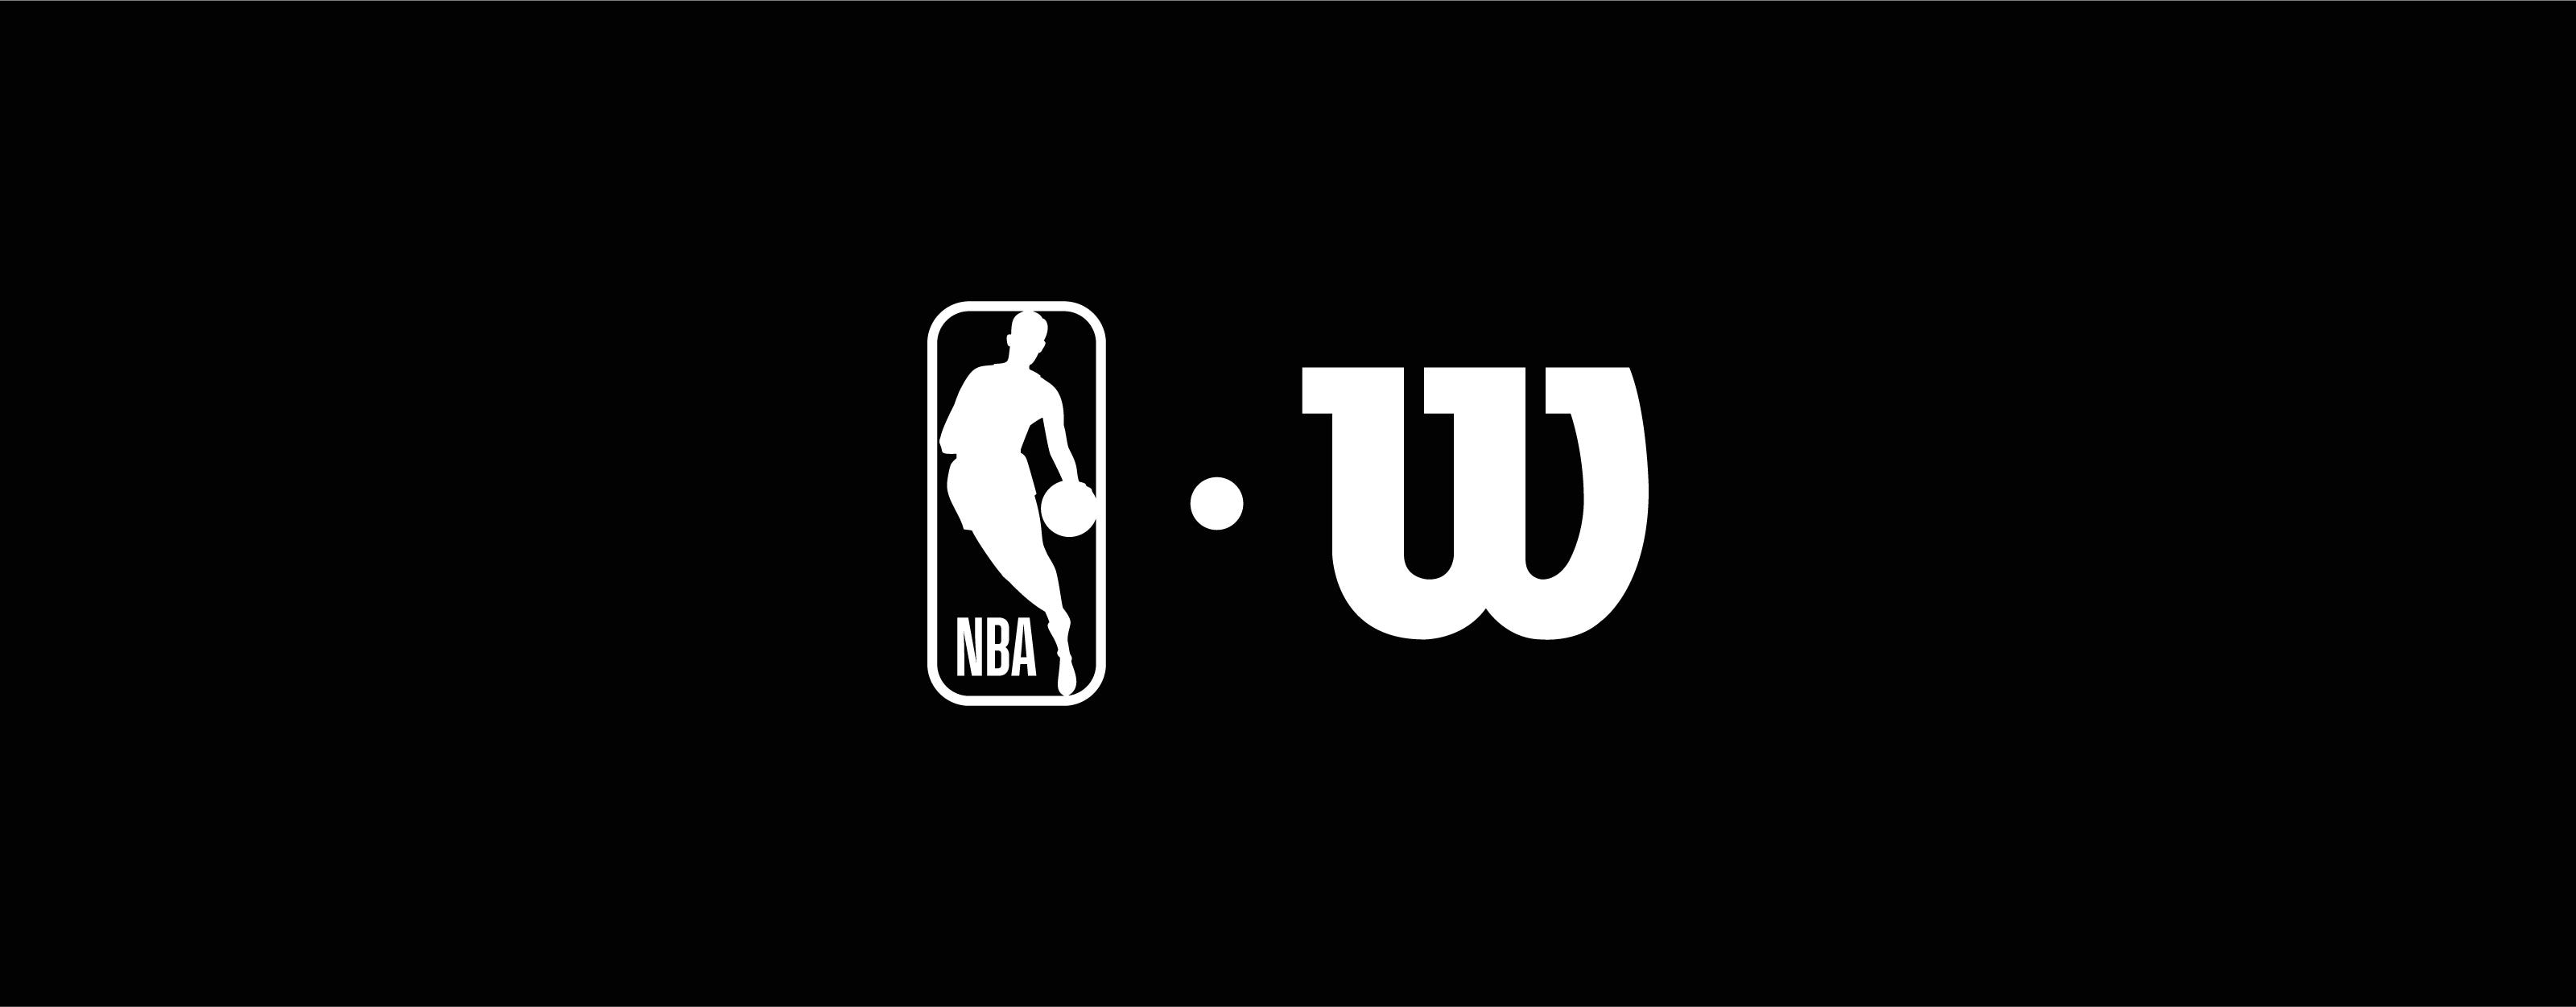 Wilson and the NBA